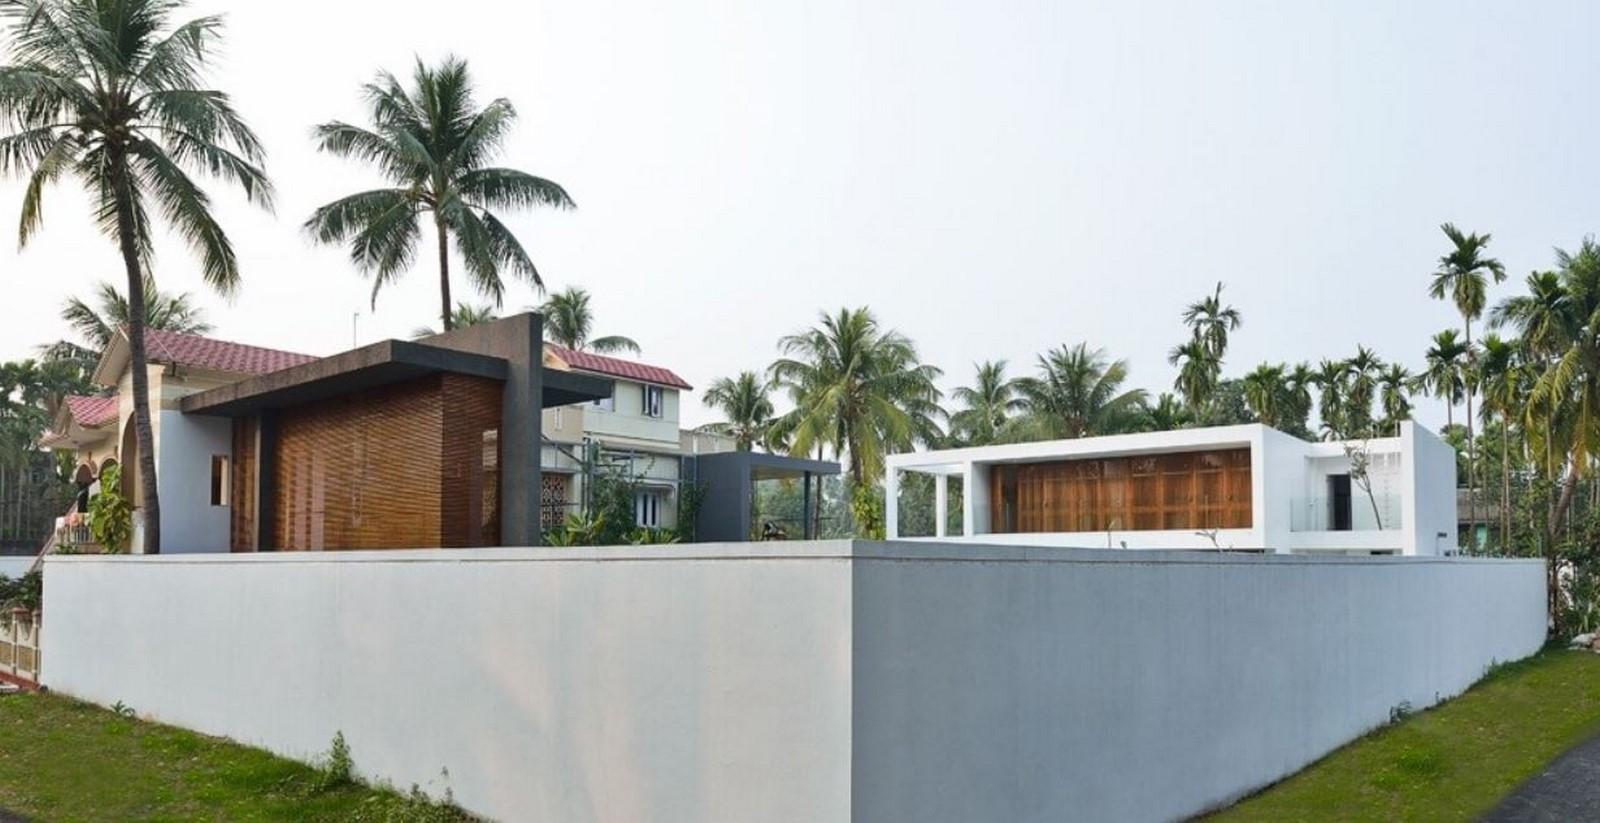 Pool House, Adisaptagram - Sheet5